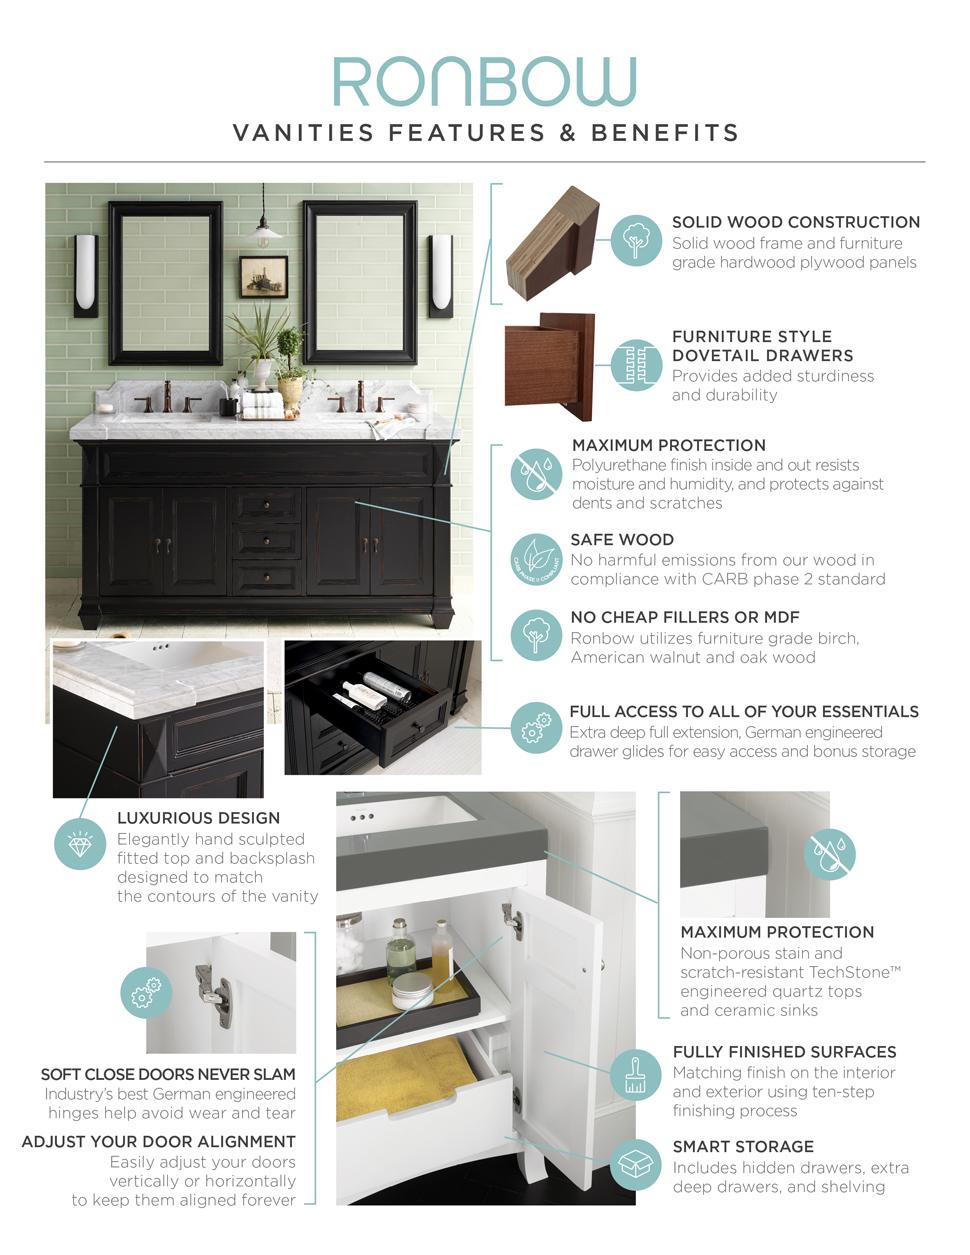 RONBOW Shaker 30 Inch Bathroom Vanity Set in Maple, Wood Cabinet ...